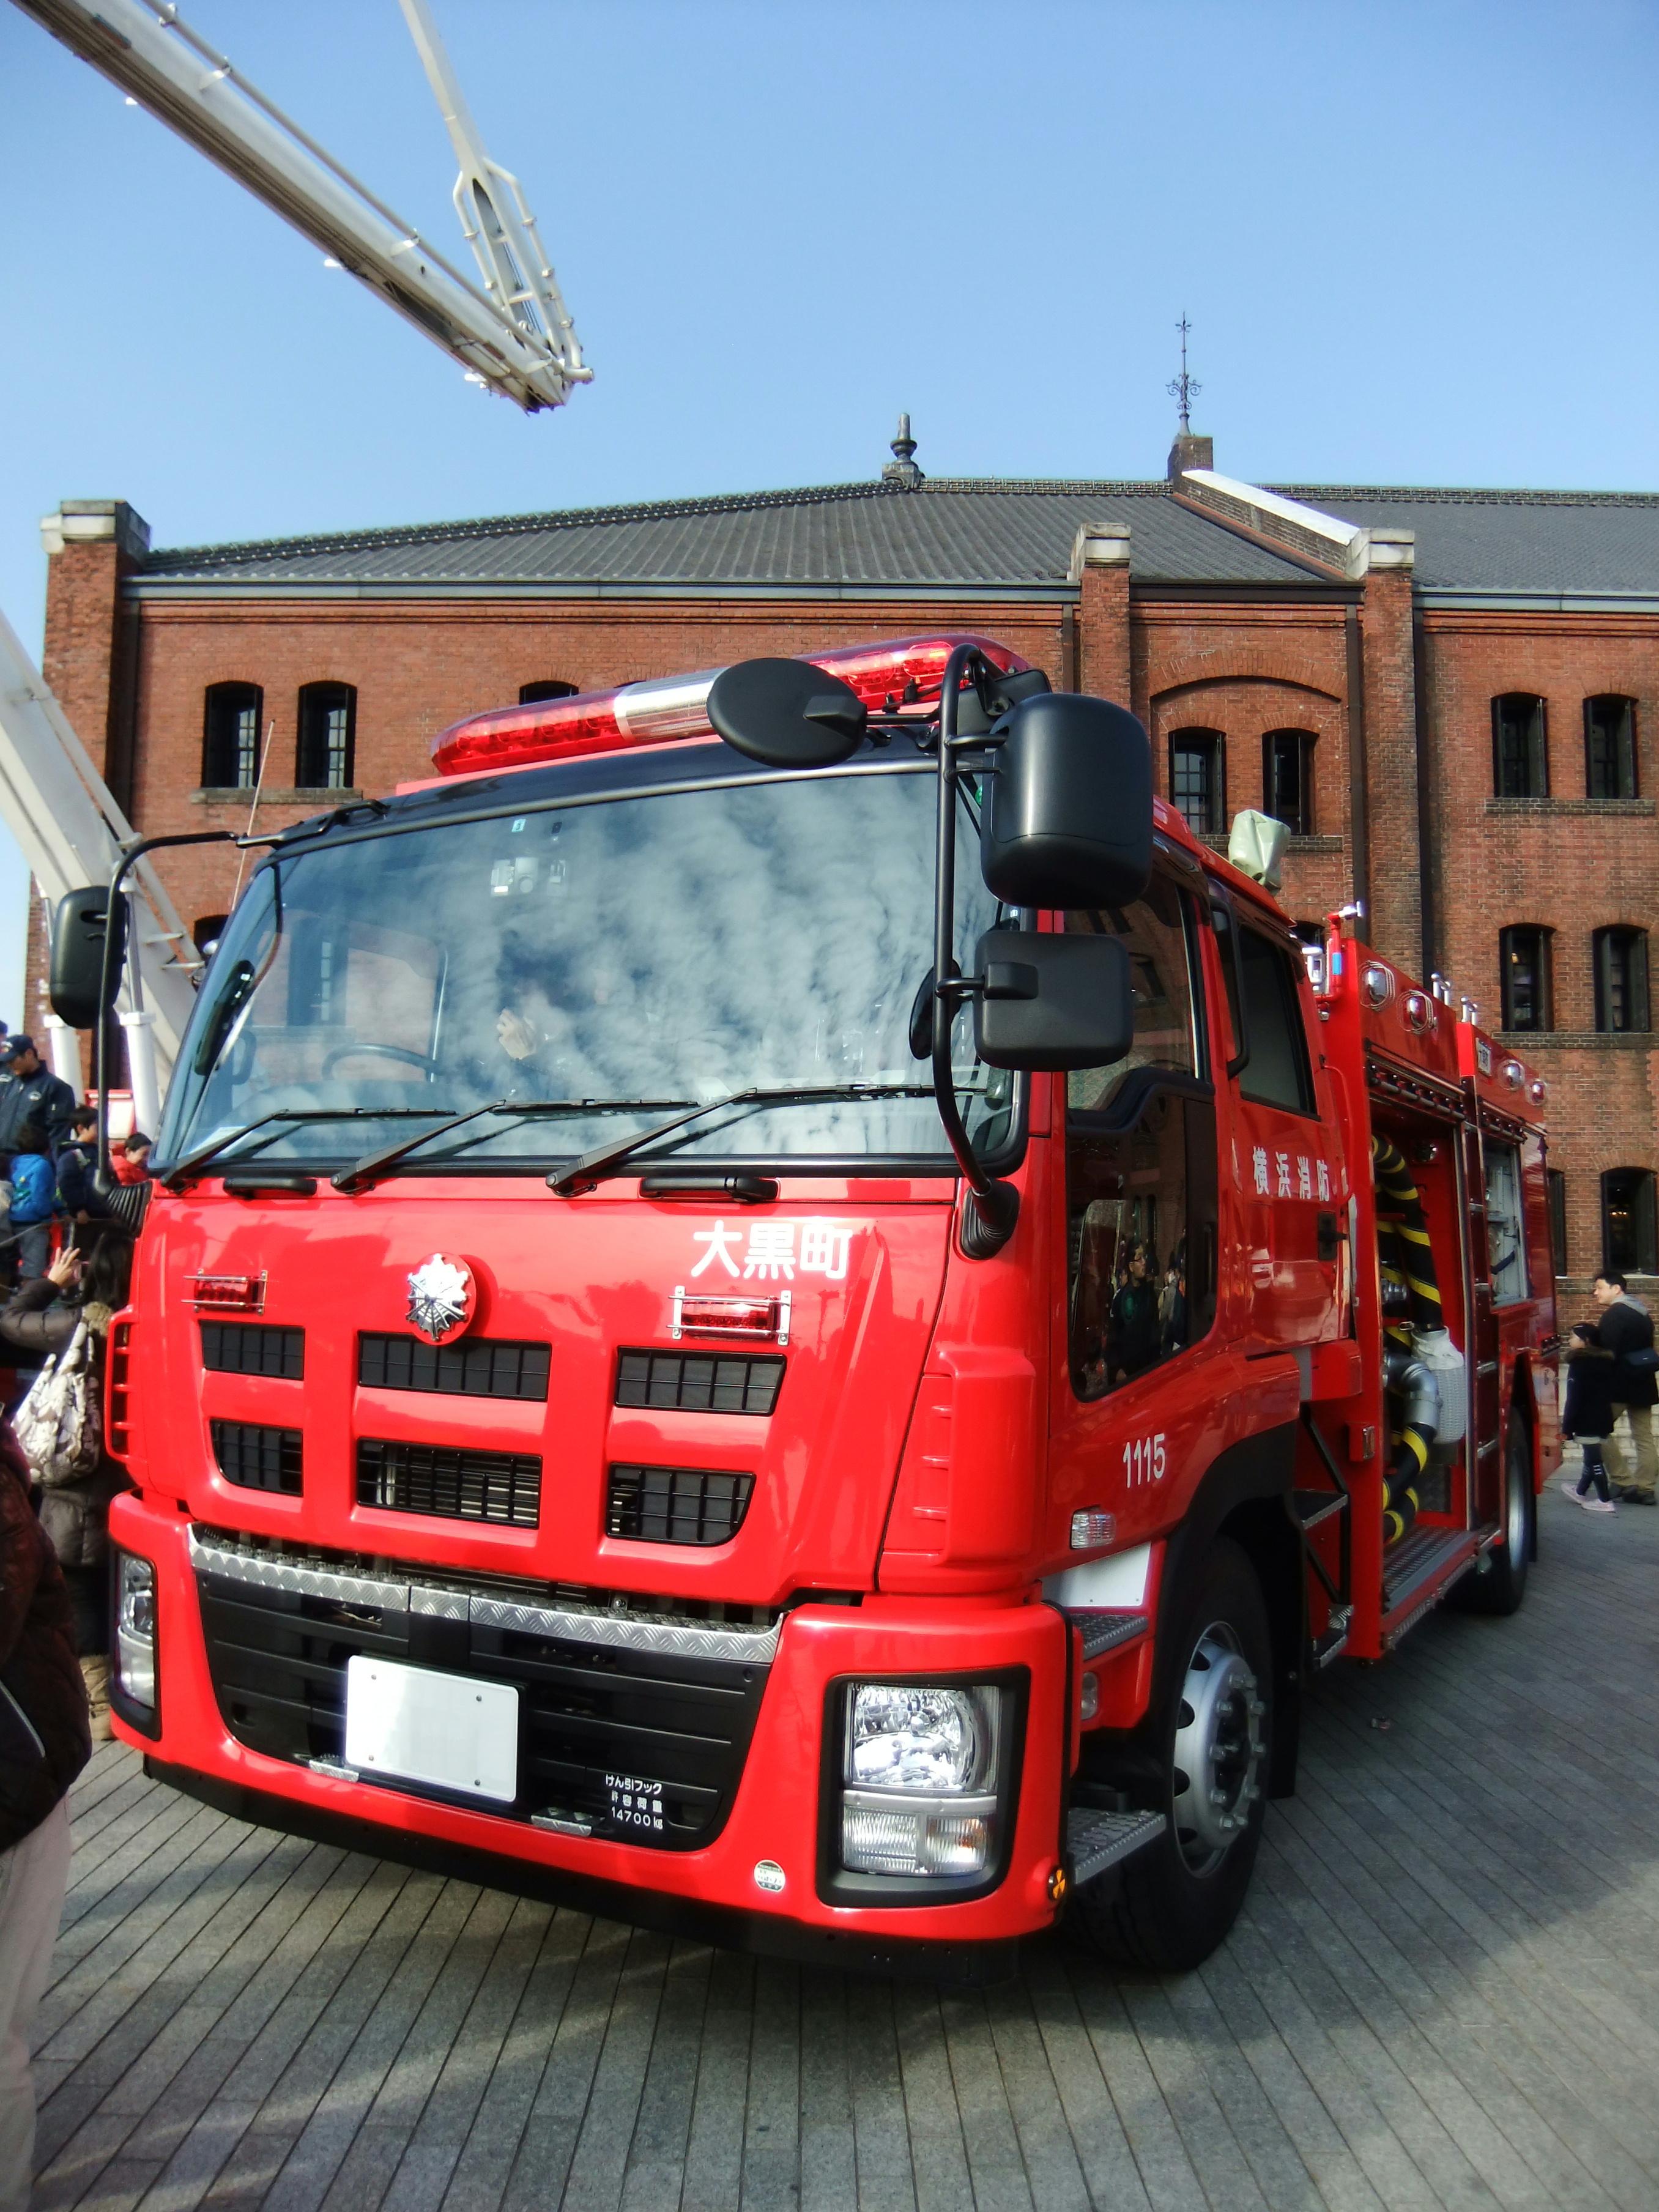 Isuzu Giga C Foam Tender C Fire Engine Ycfd C Double Cab